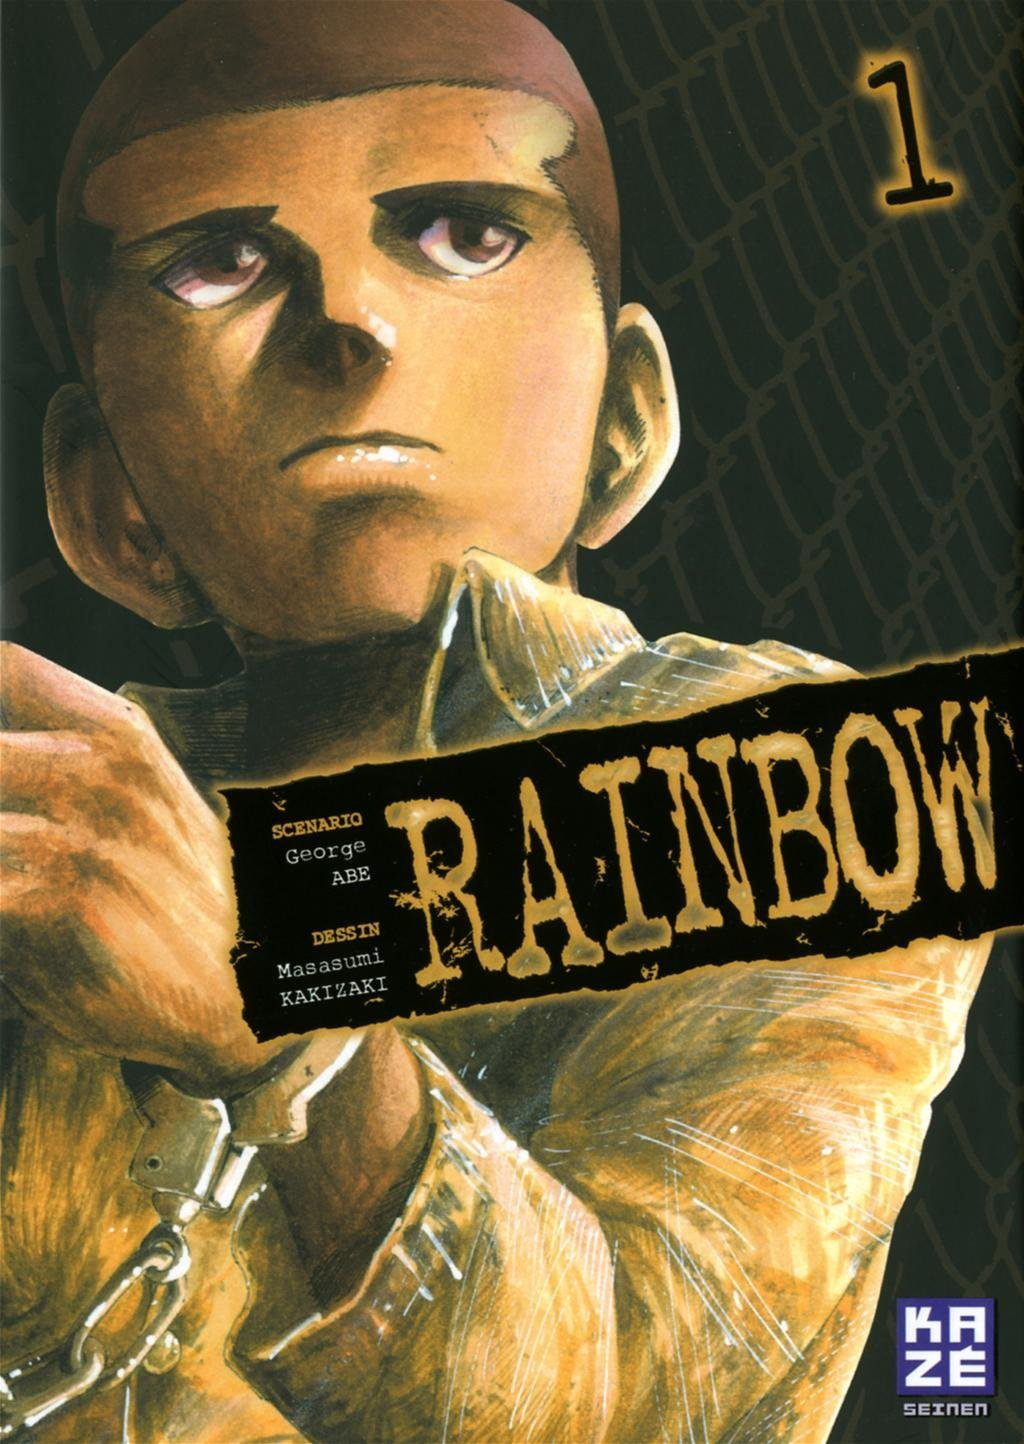 RAINBOW © 2004 ABE GEORGE, KAKIZAKI MASASUMI / Shogakukan Inc.